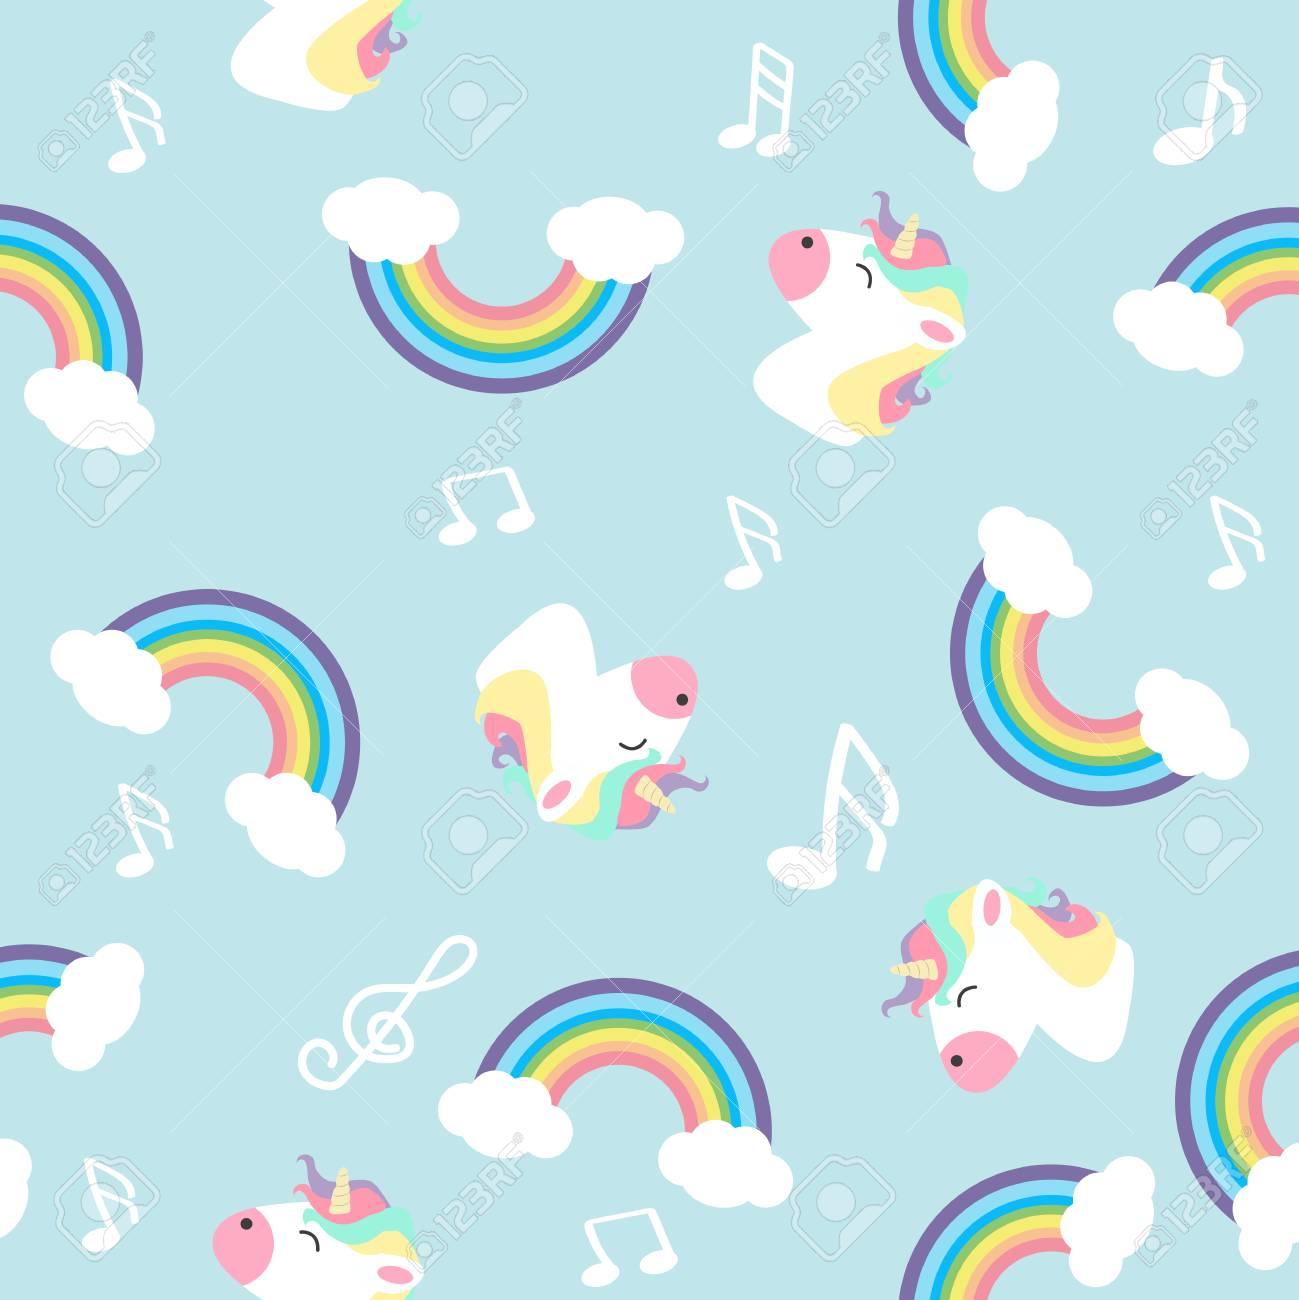 Pastel rainbow unicorn with note seamless pattern - 125555942